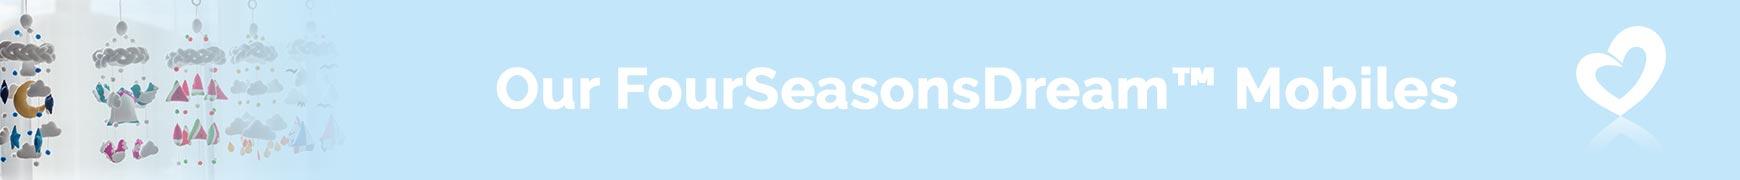 FourSeasonsDream™ Mobiles